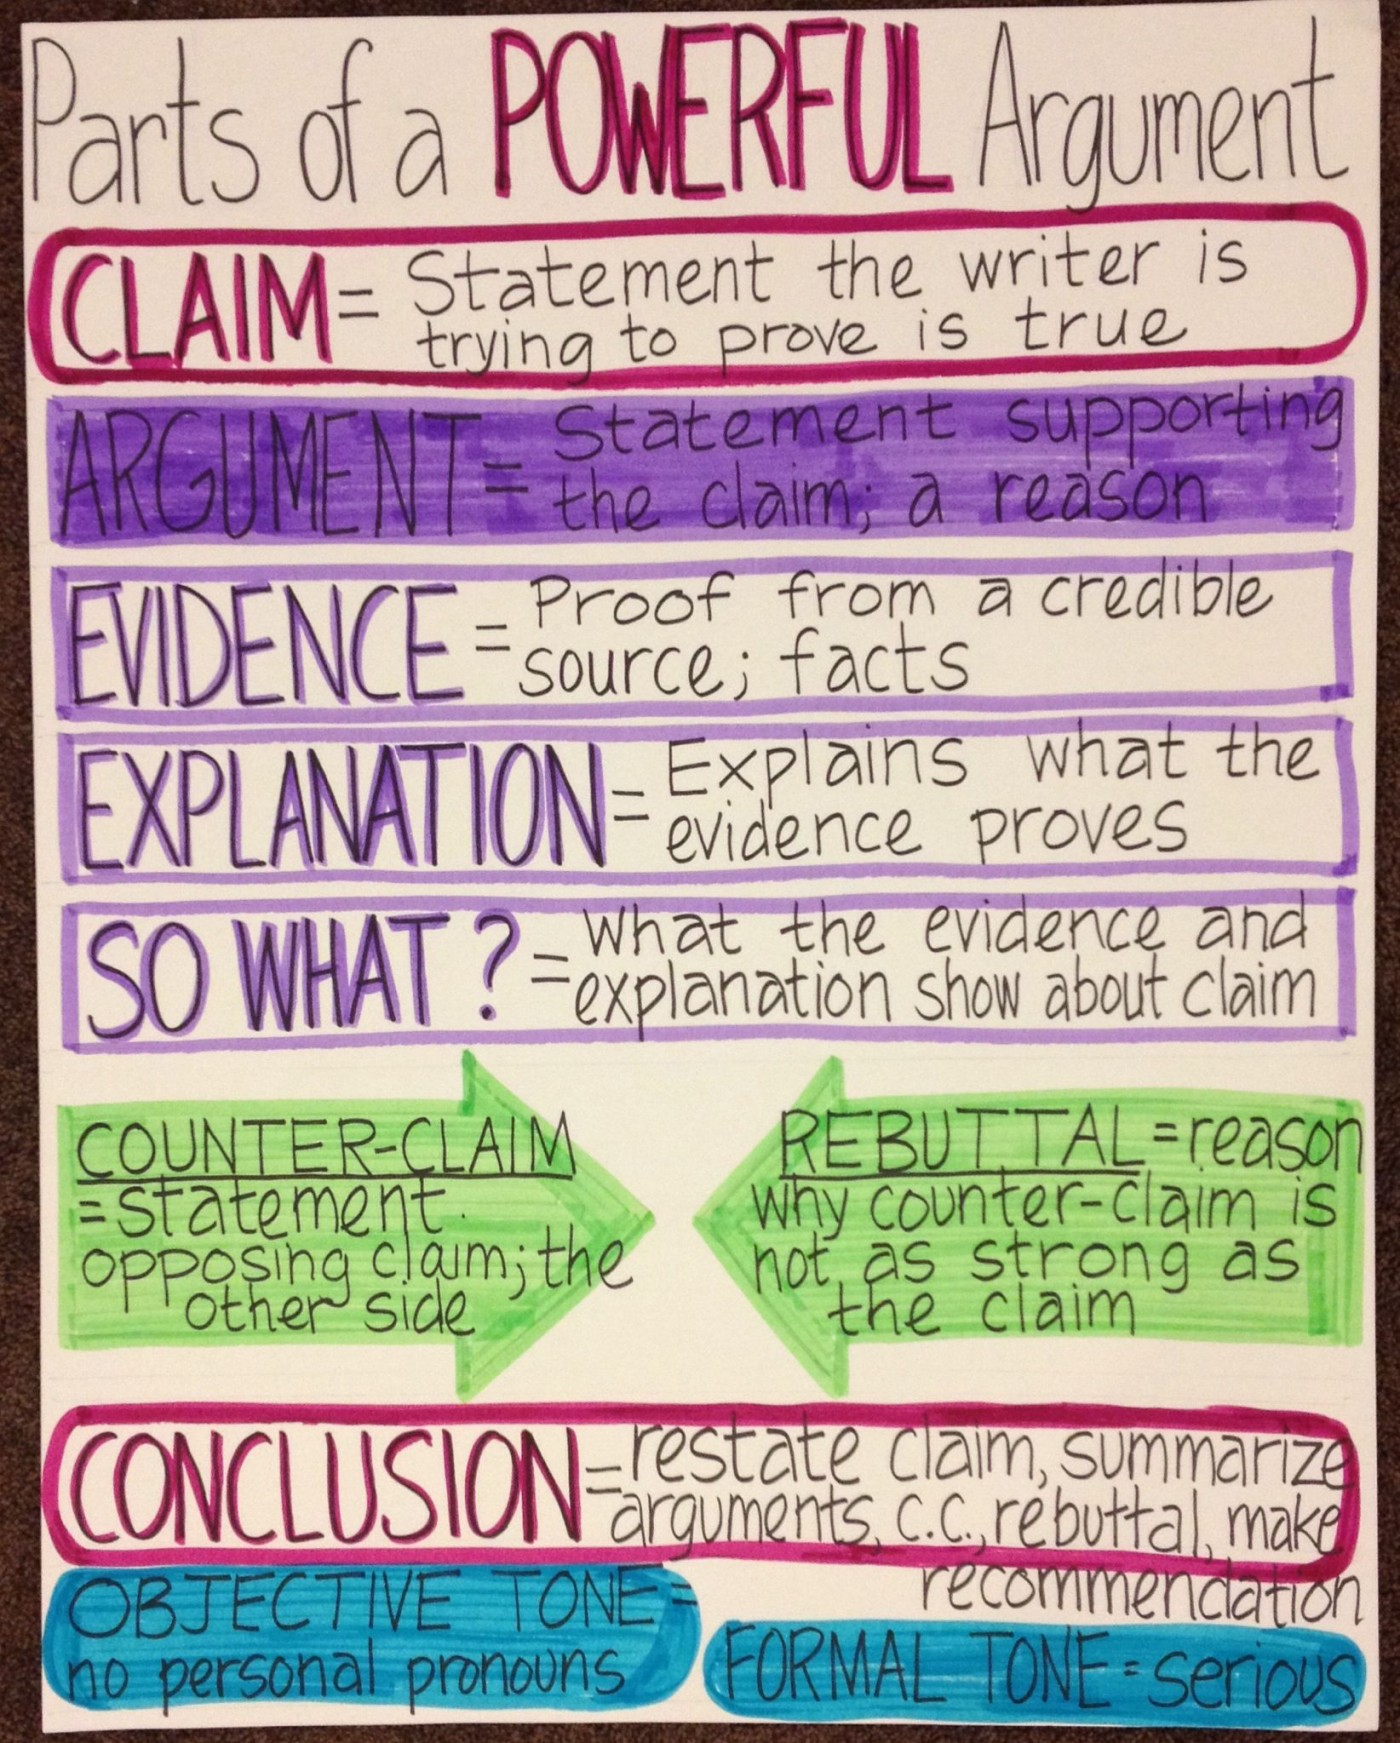 009 Essay Example Parts Of Singular Argumentative An Quiz Middle School Evidence 1400